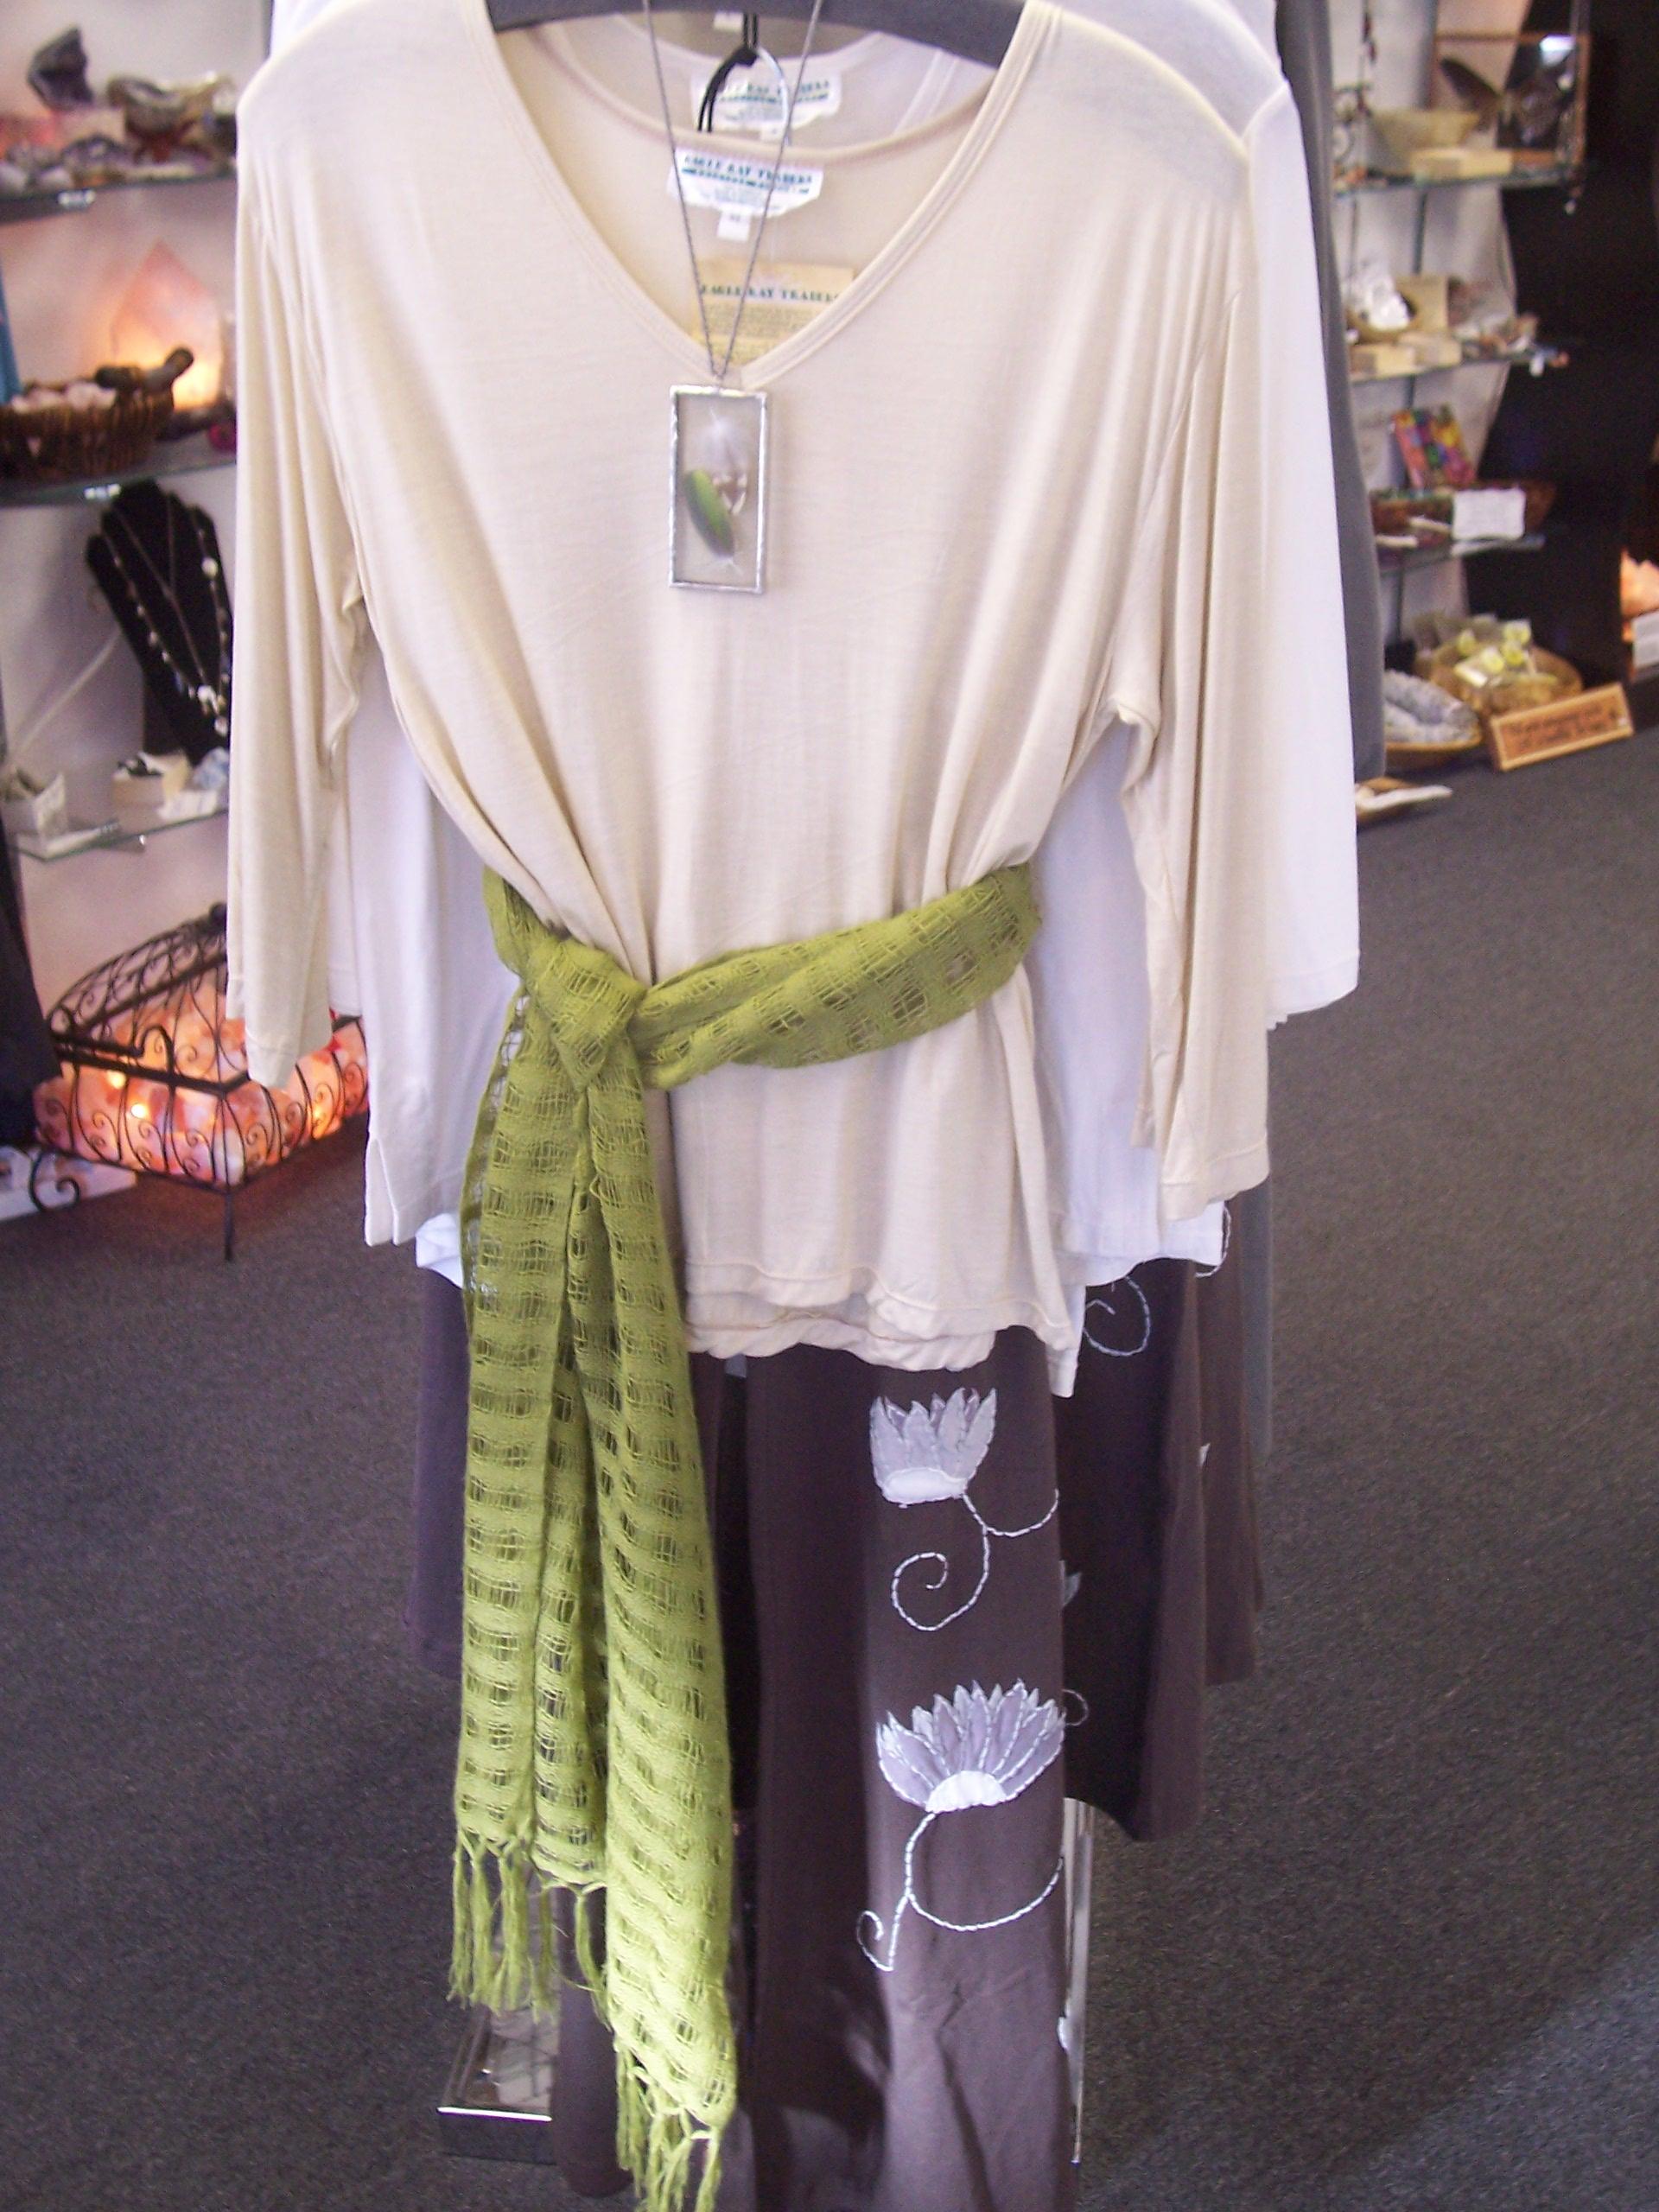 Natural Fiber Clothing, soft and comfy